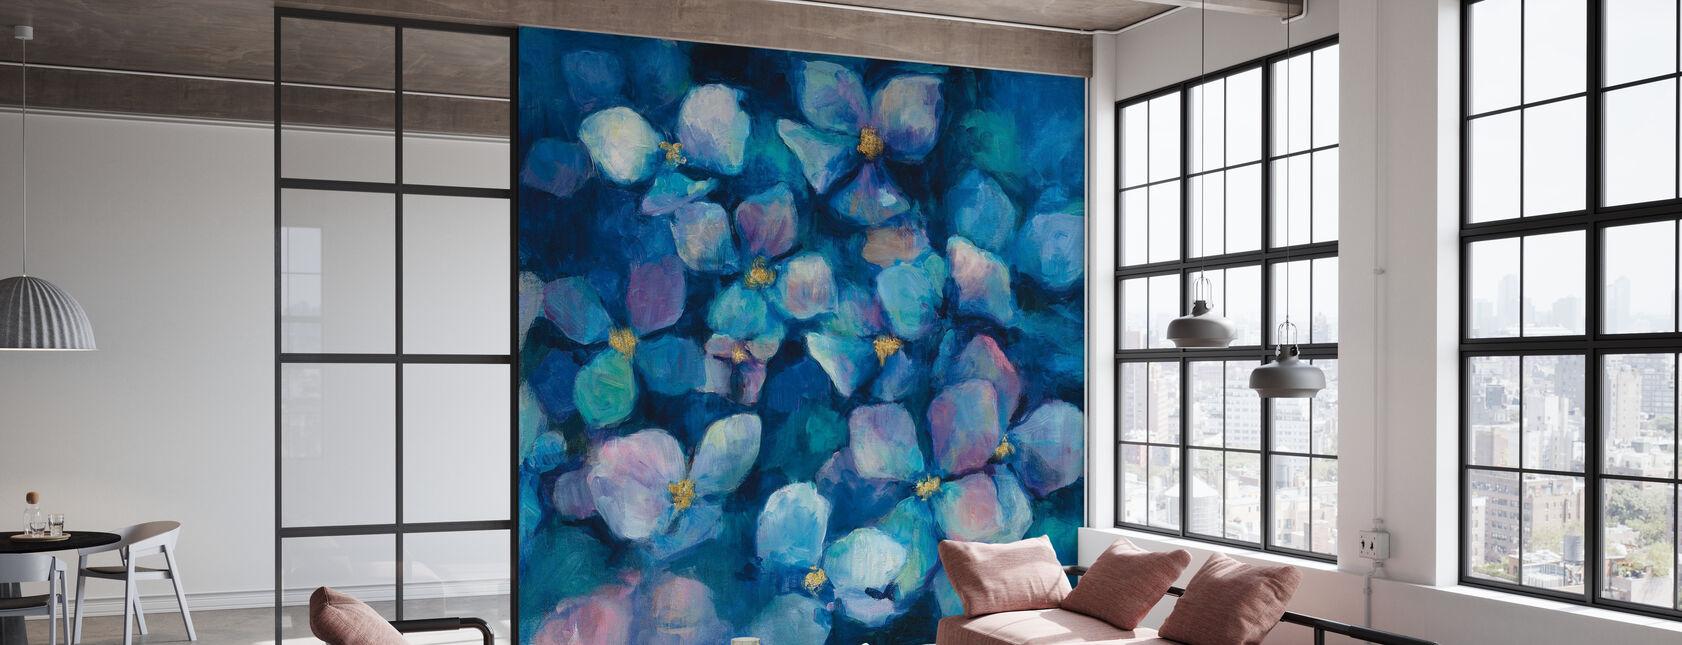 Midnight Blue Hydrangeas with Gold - Wallpaper - Office